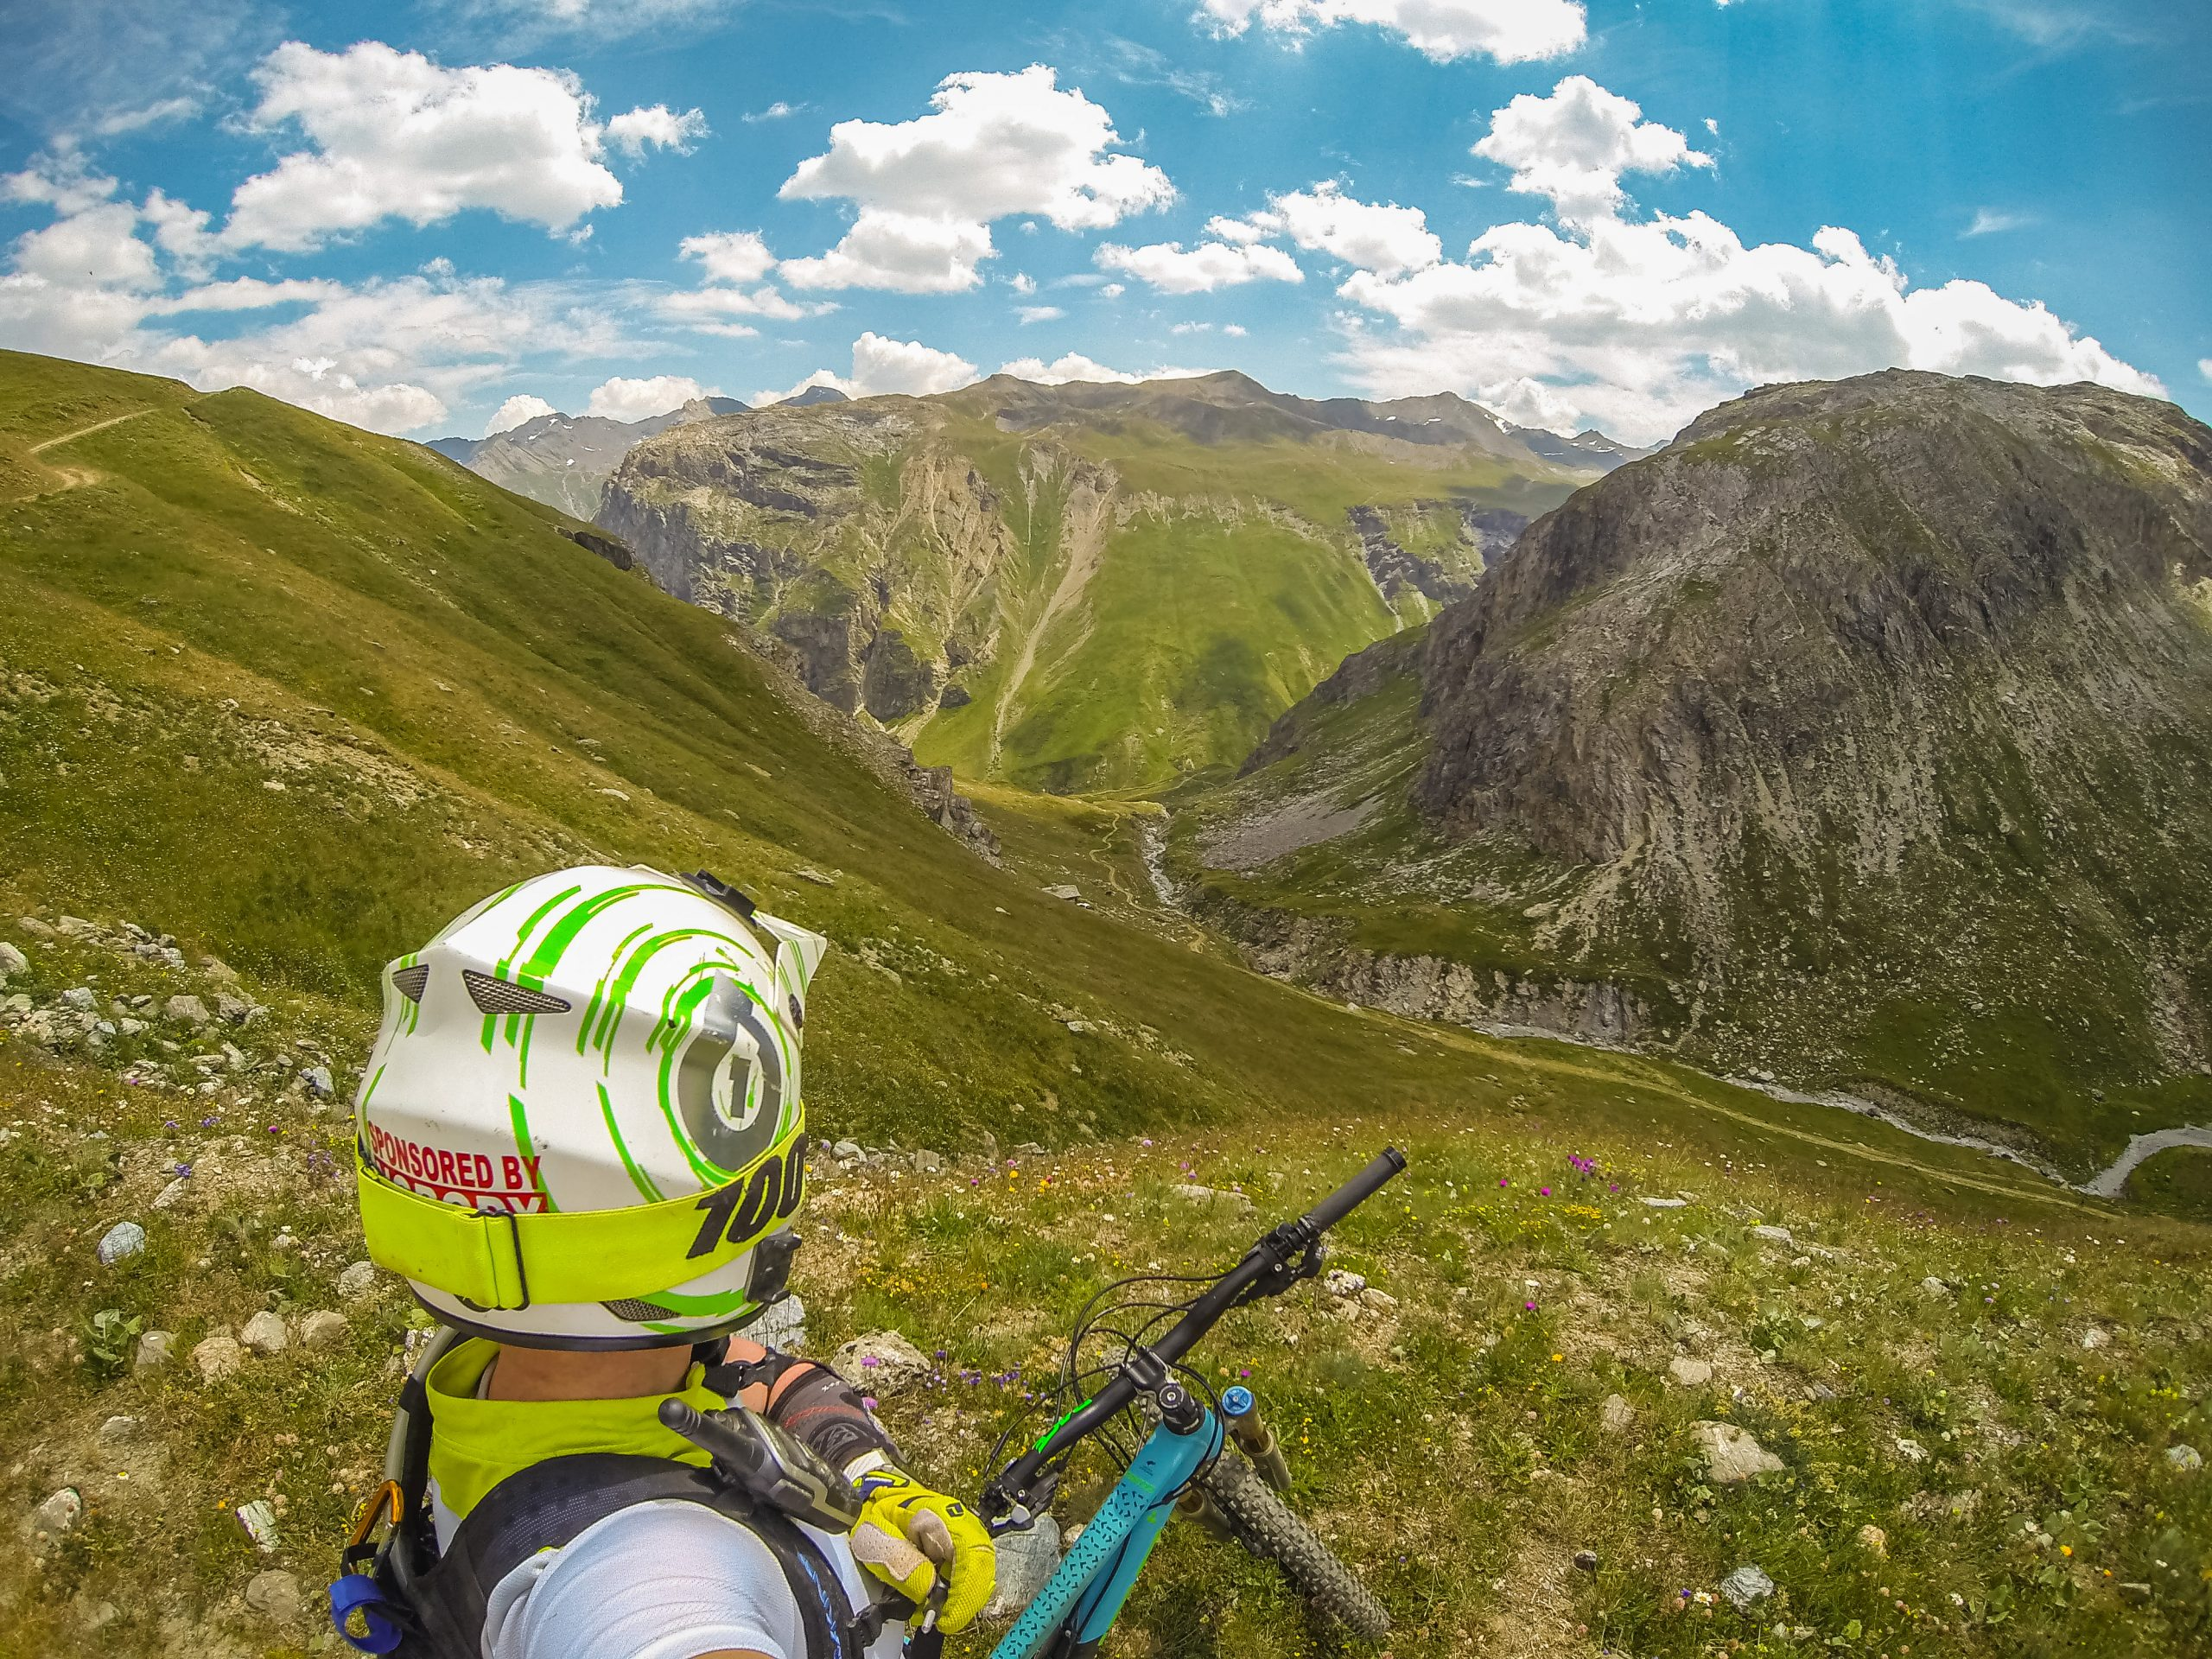 Fiona mountain biking